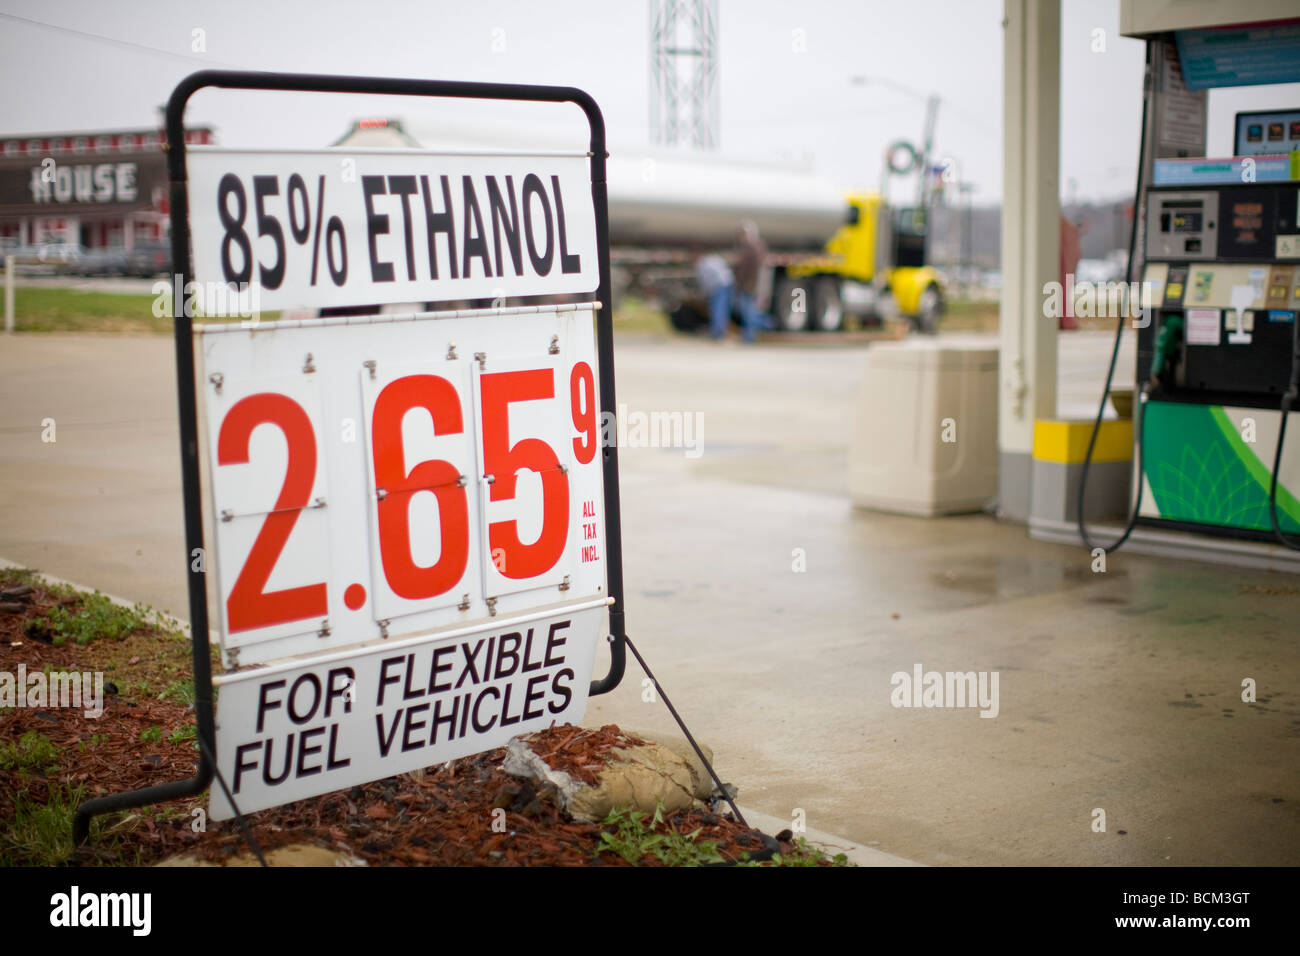 Sign for E 85 Ethanol Blend Fuel - Stock Image